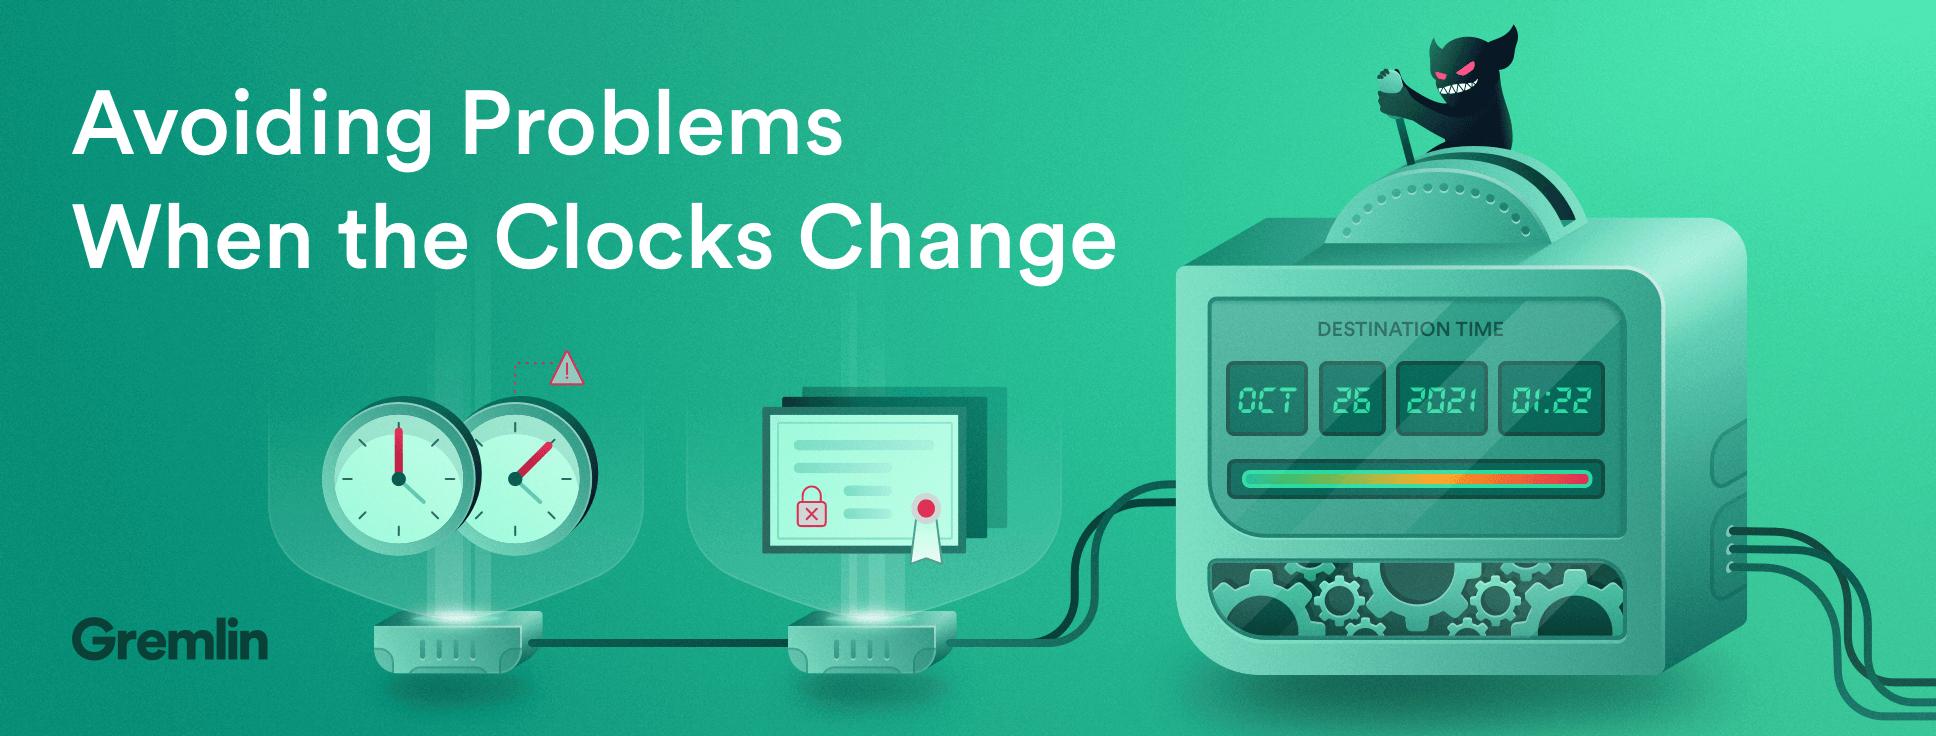 Avoiding Problems When the Clocks Change